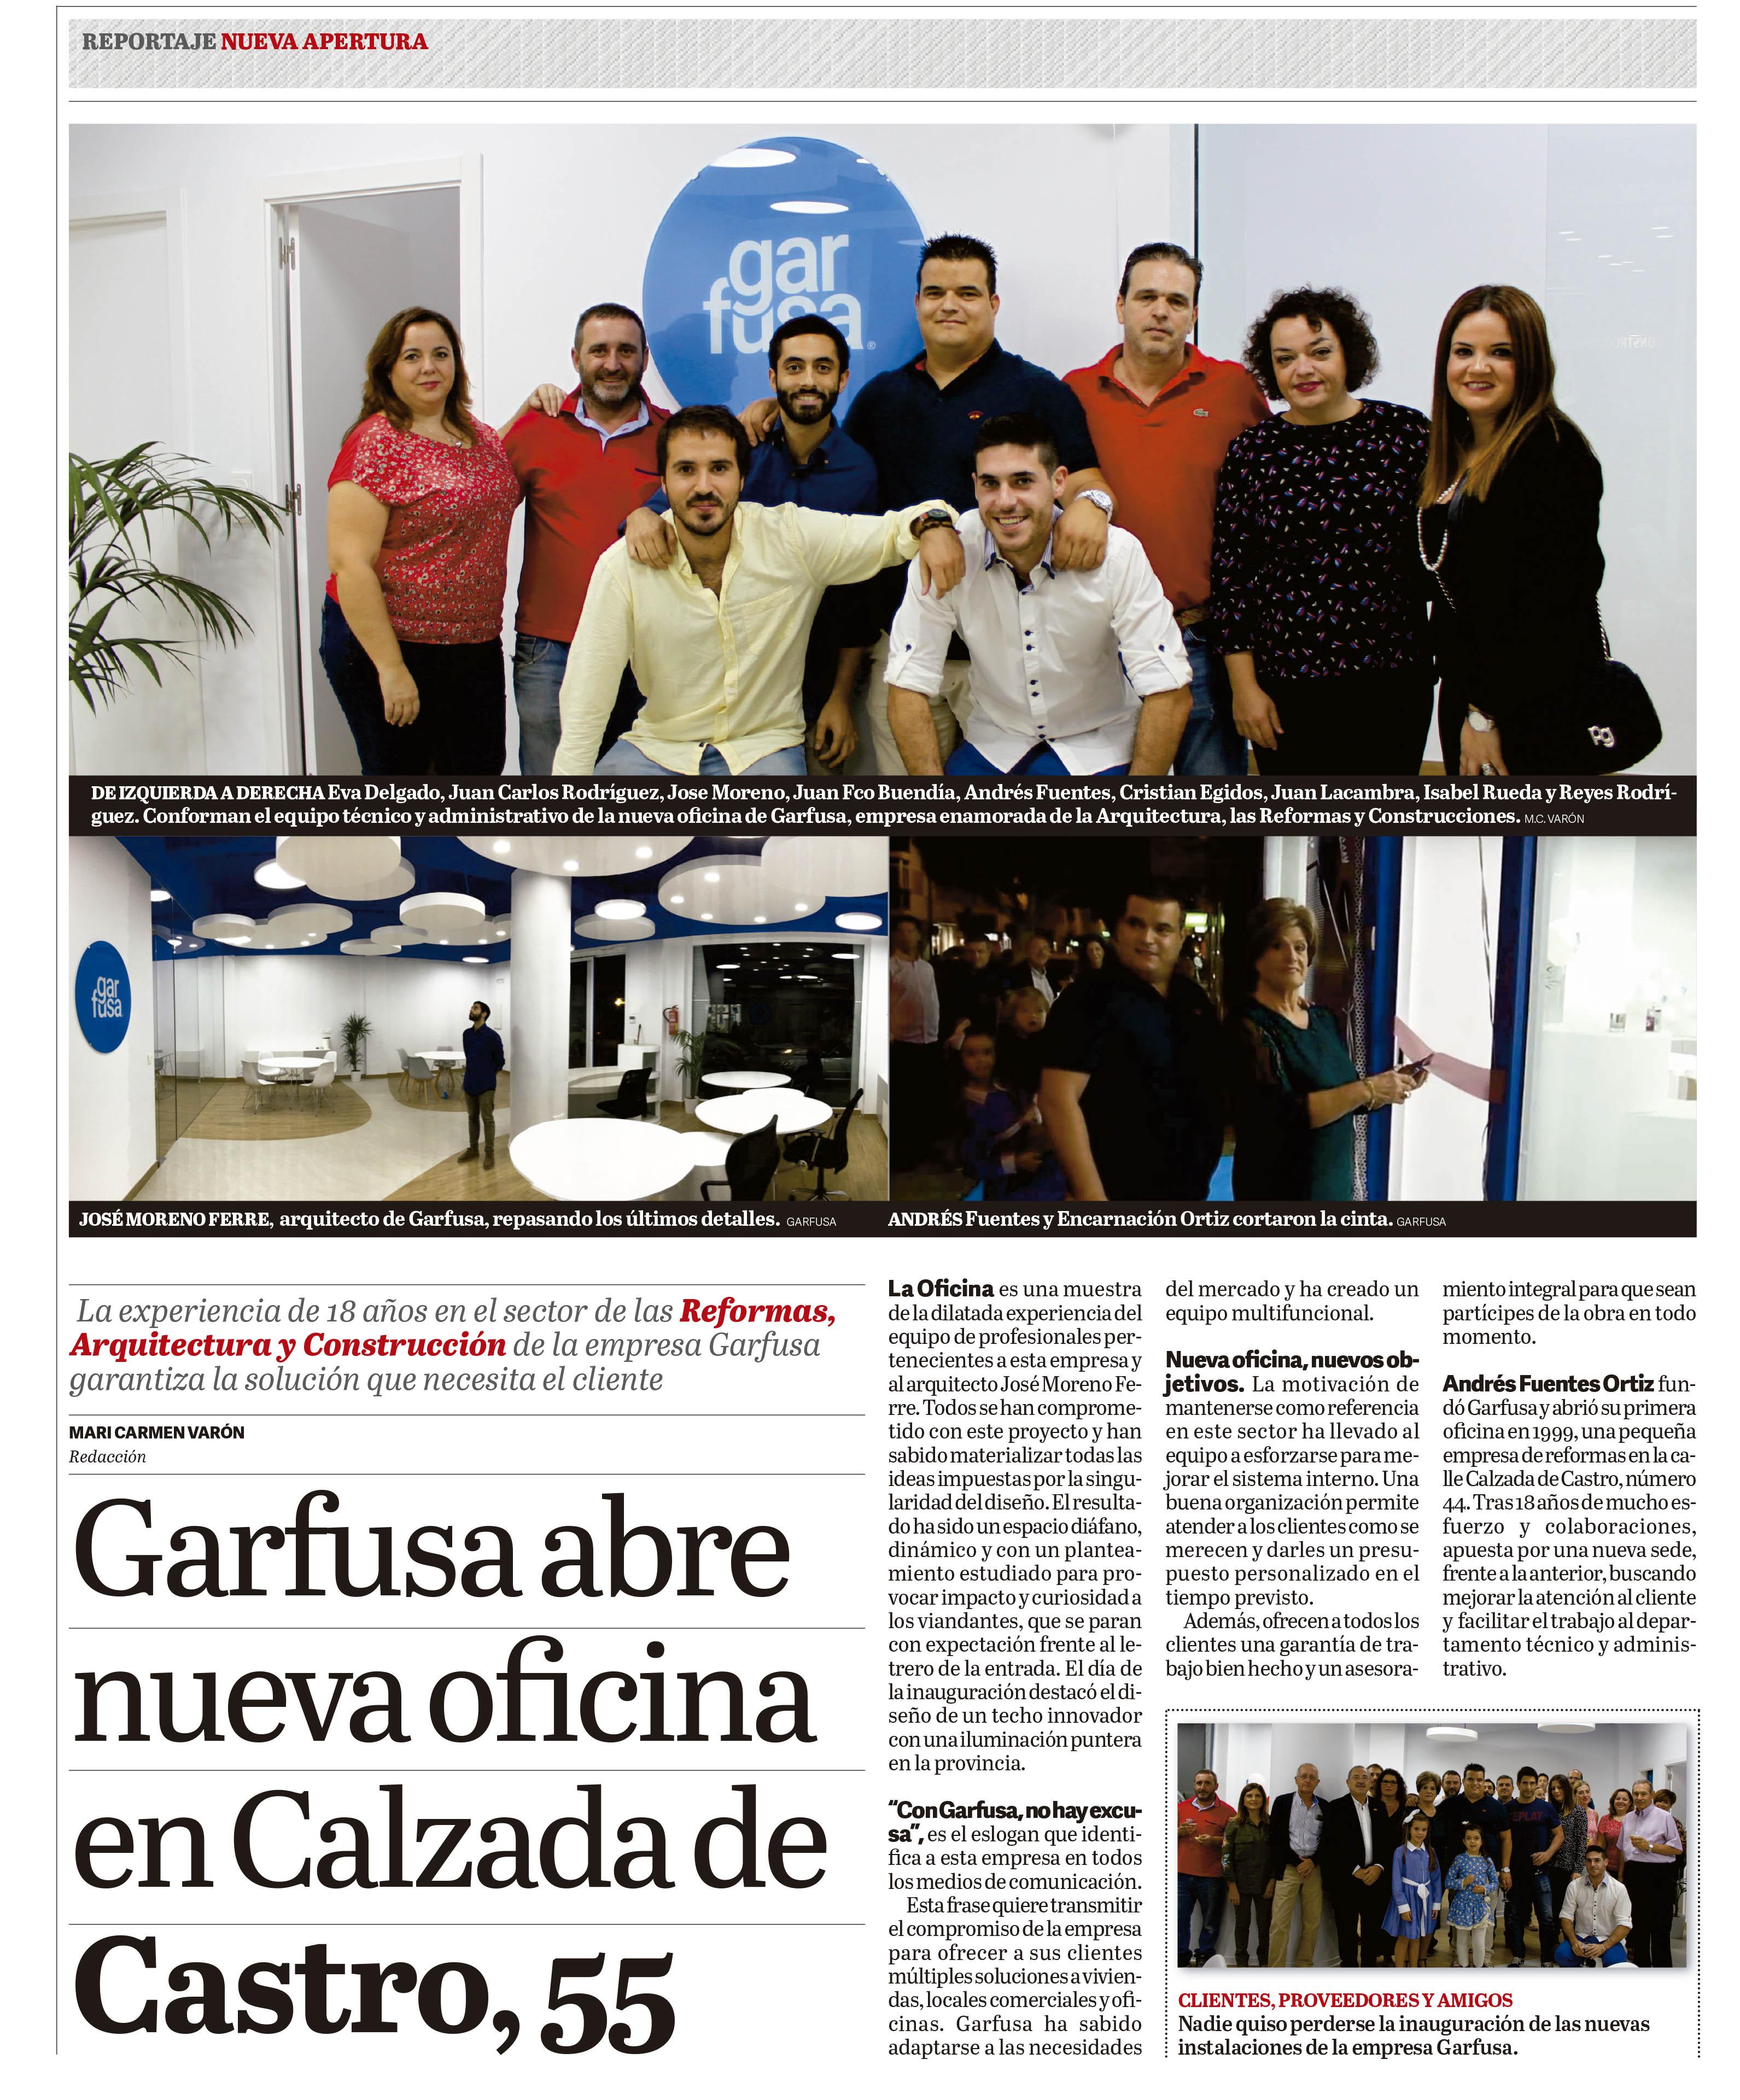 Nueva oficina Garfusa